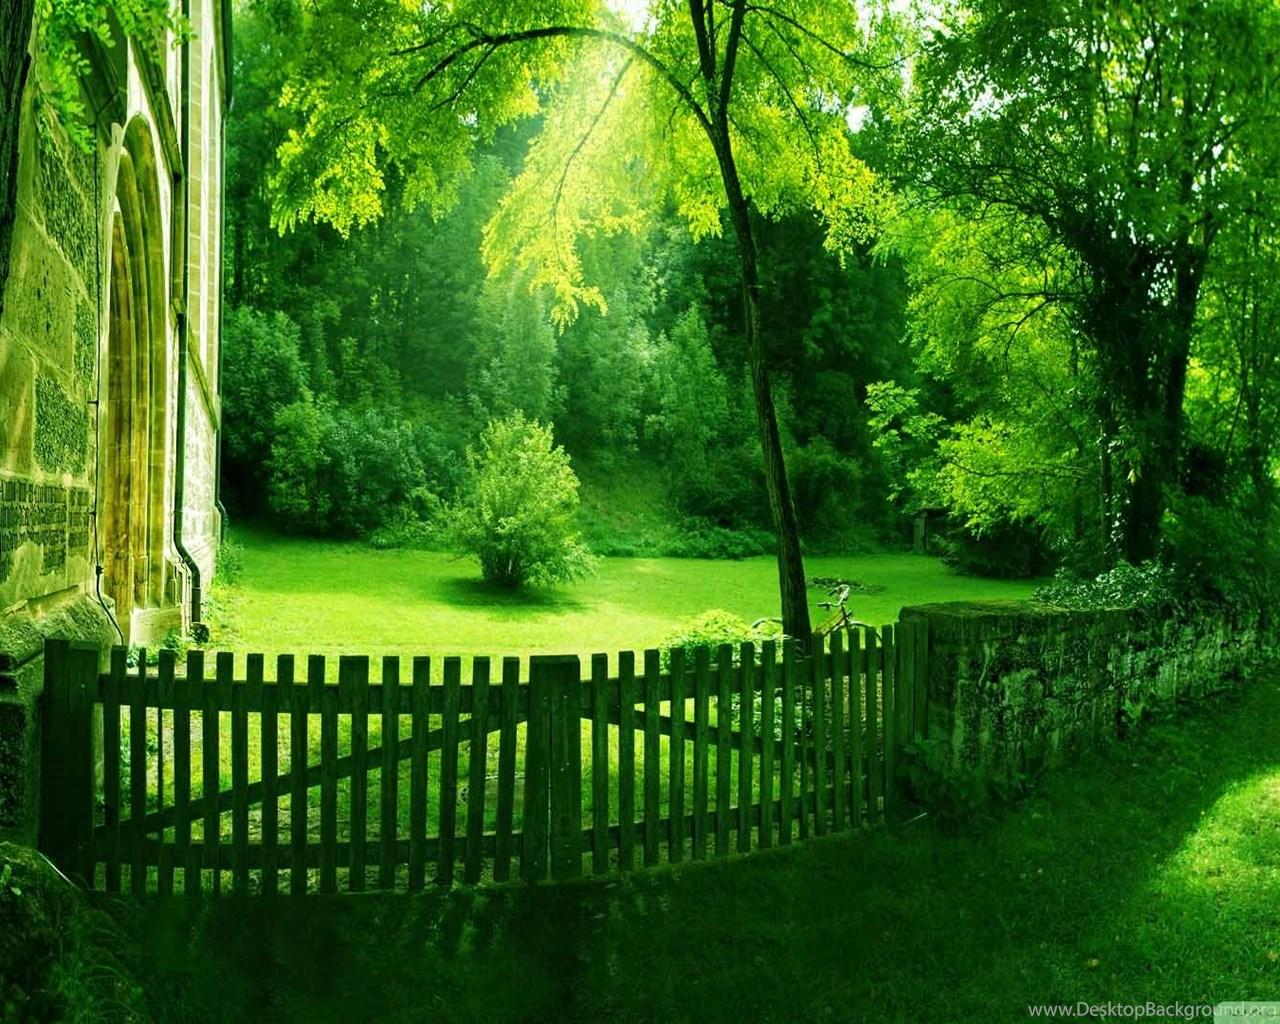 633143 nature wallpapers hd for desktop high resolution best hd